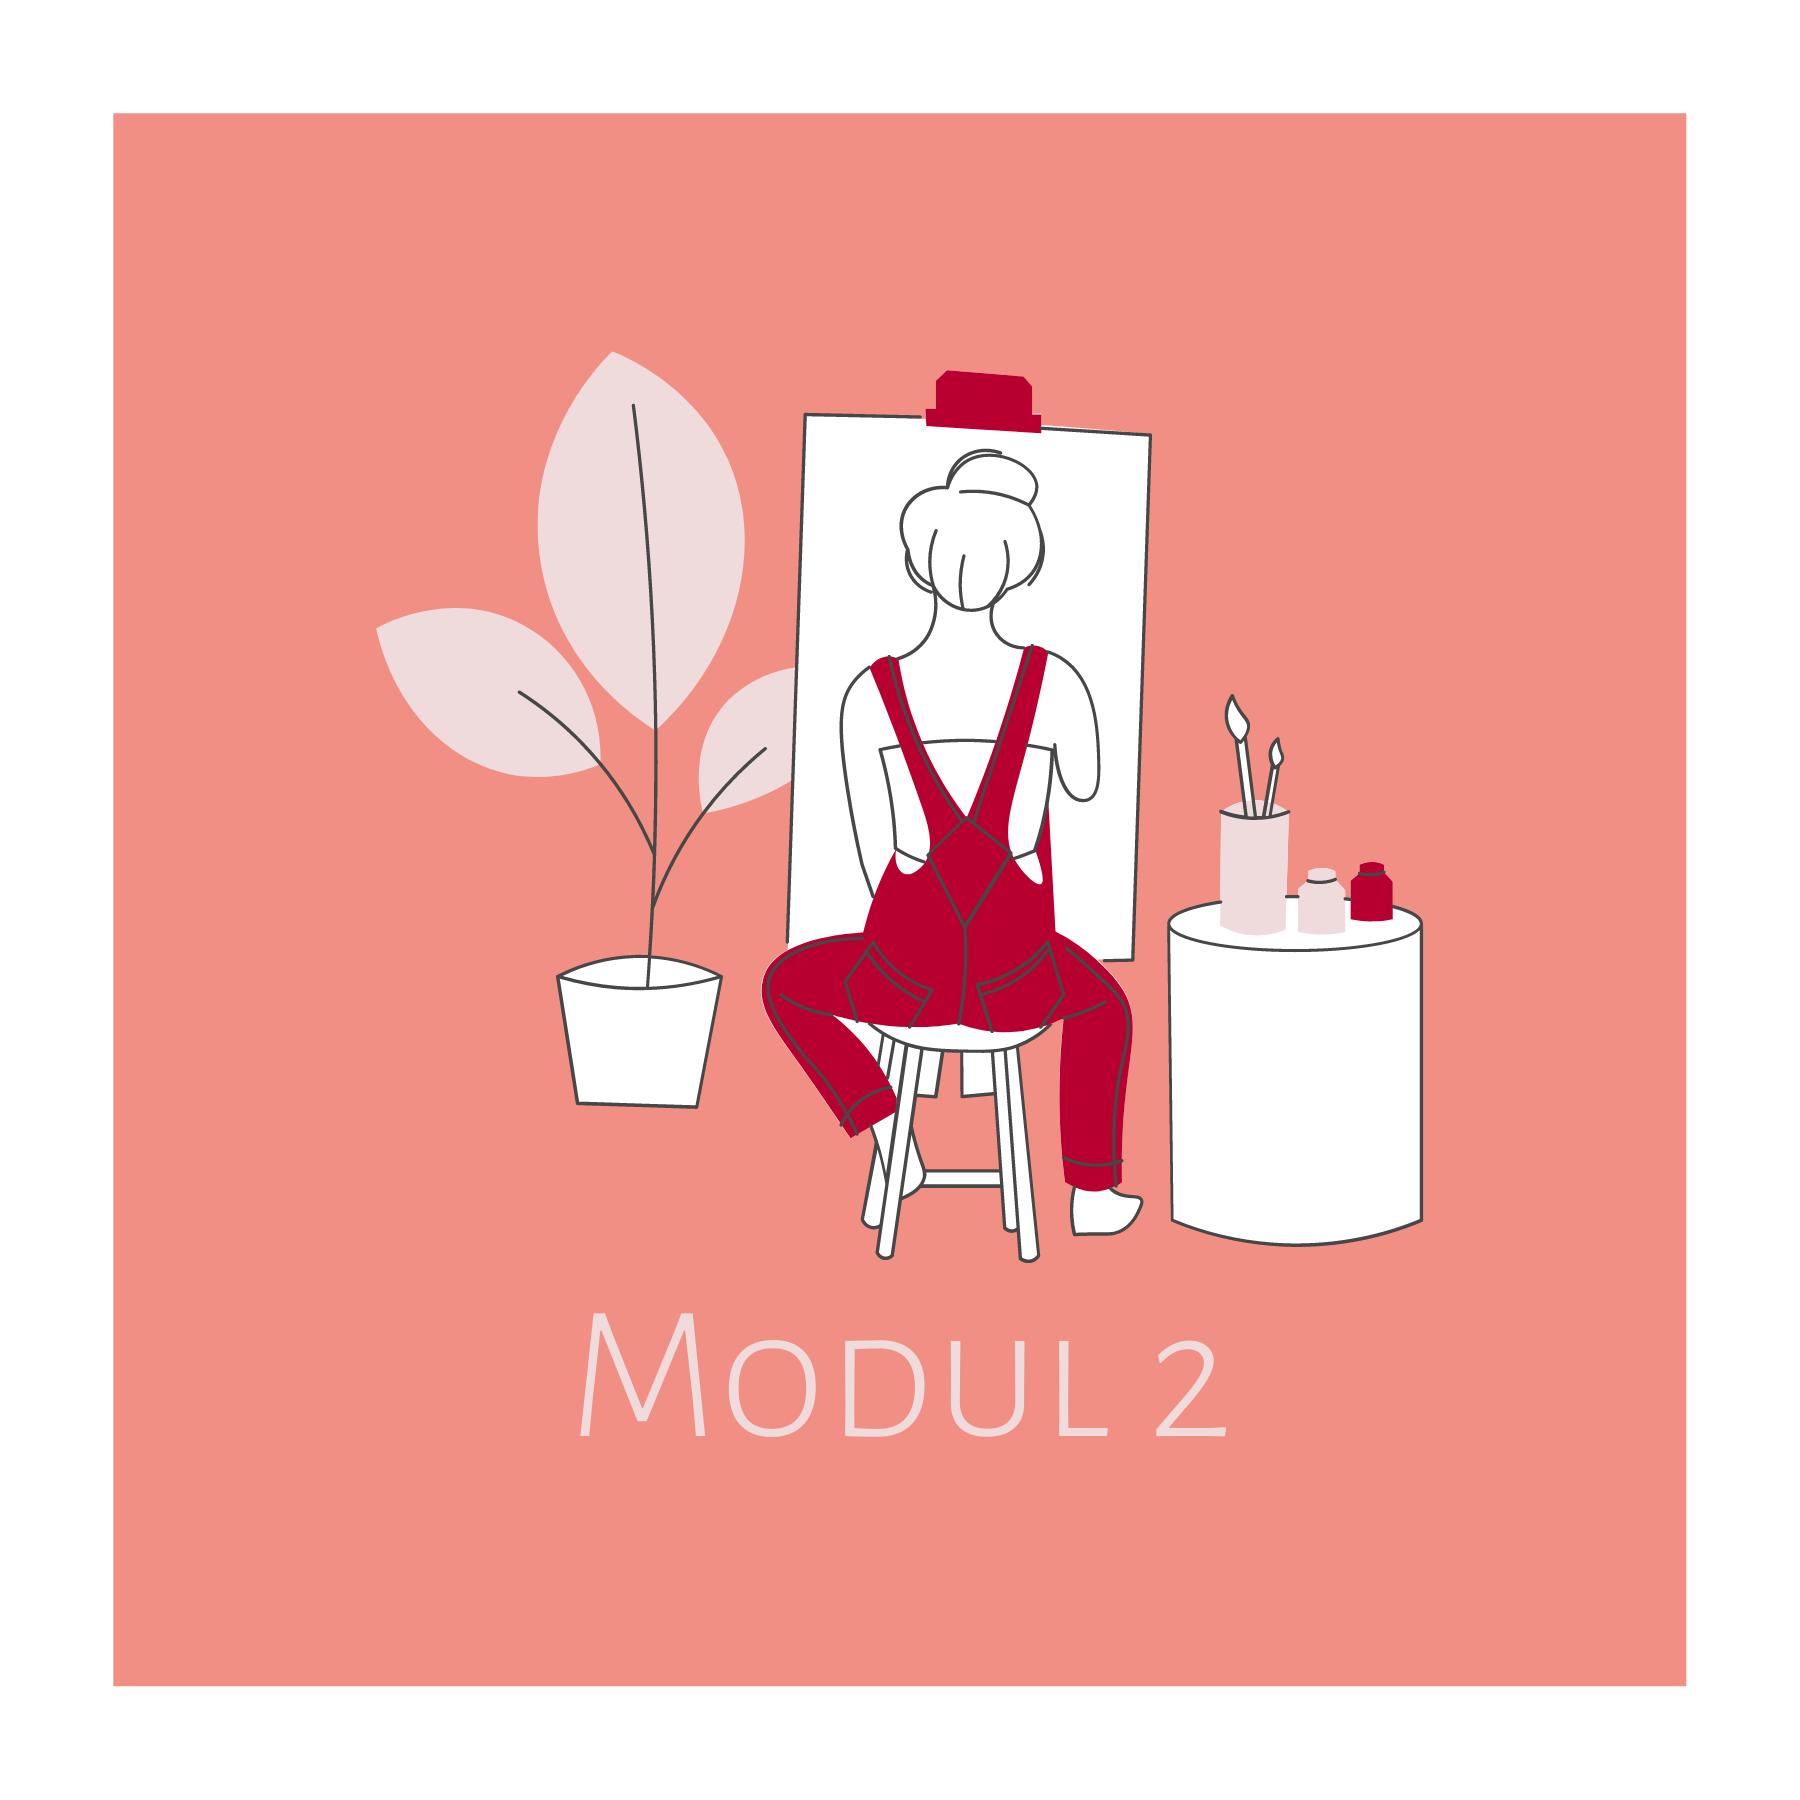 dessous_design_online_ktriny_modul2